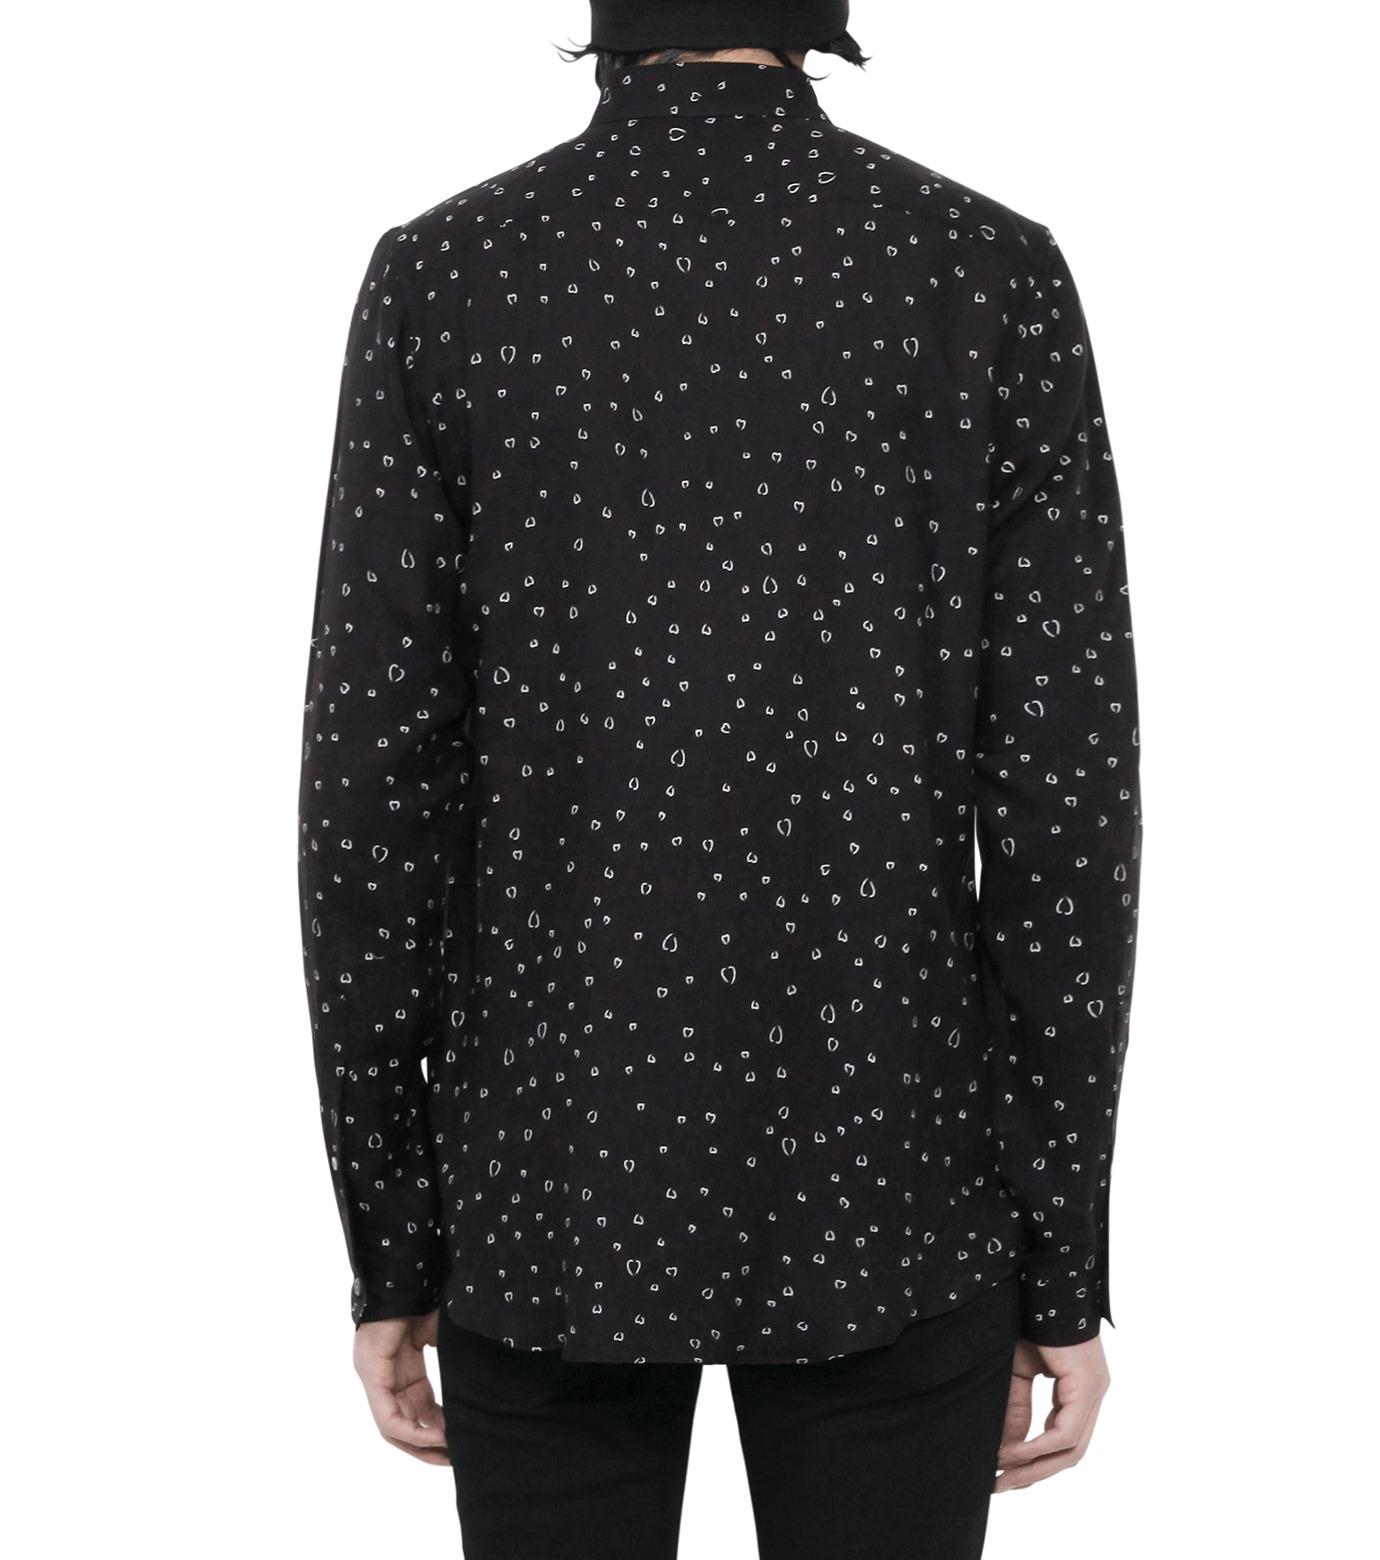 HL HEDDIE LOVU(エイチエル・エディールーヴ)のLINE HEART PATTERN SHIRT-BLACK(シャツ/shirt)-18S93002-13 拡大詳細画像4